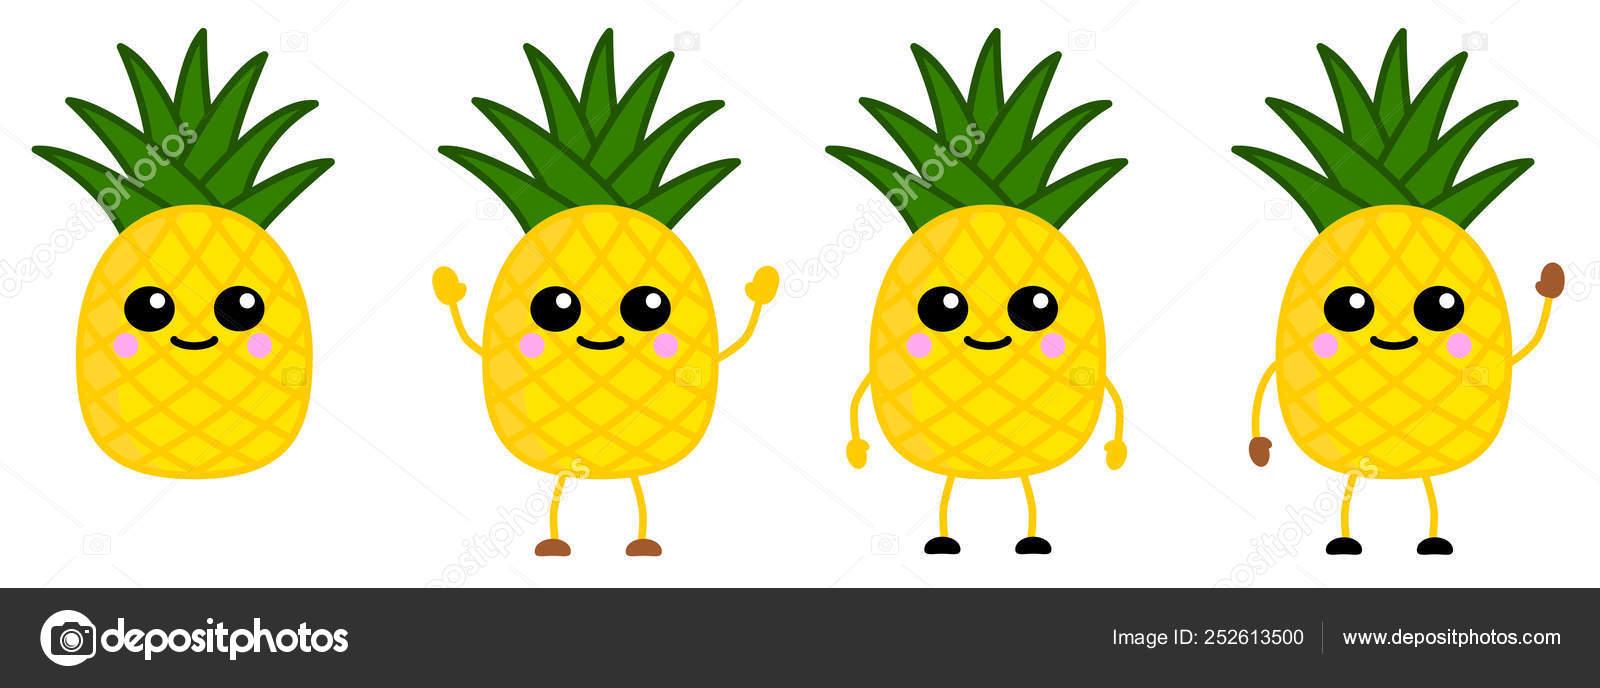 Cute Kawaii Style Pineapple Fruit Icon Large Eyes Smiling